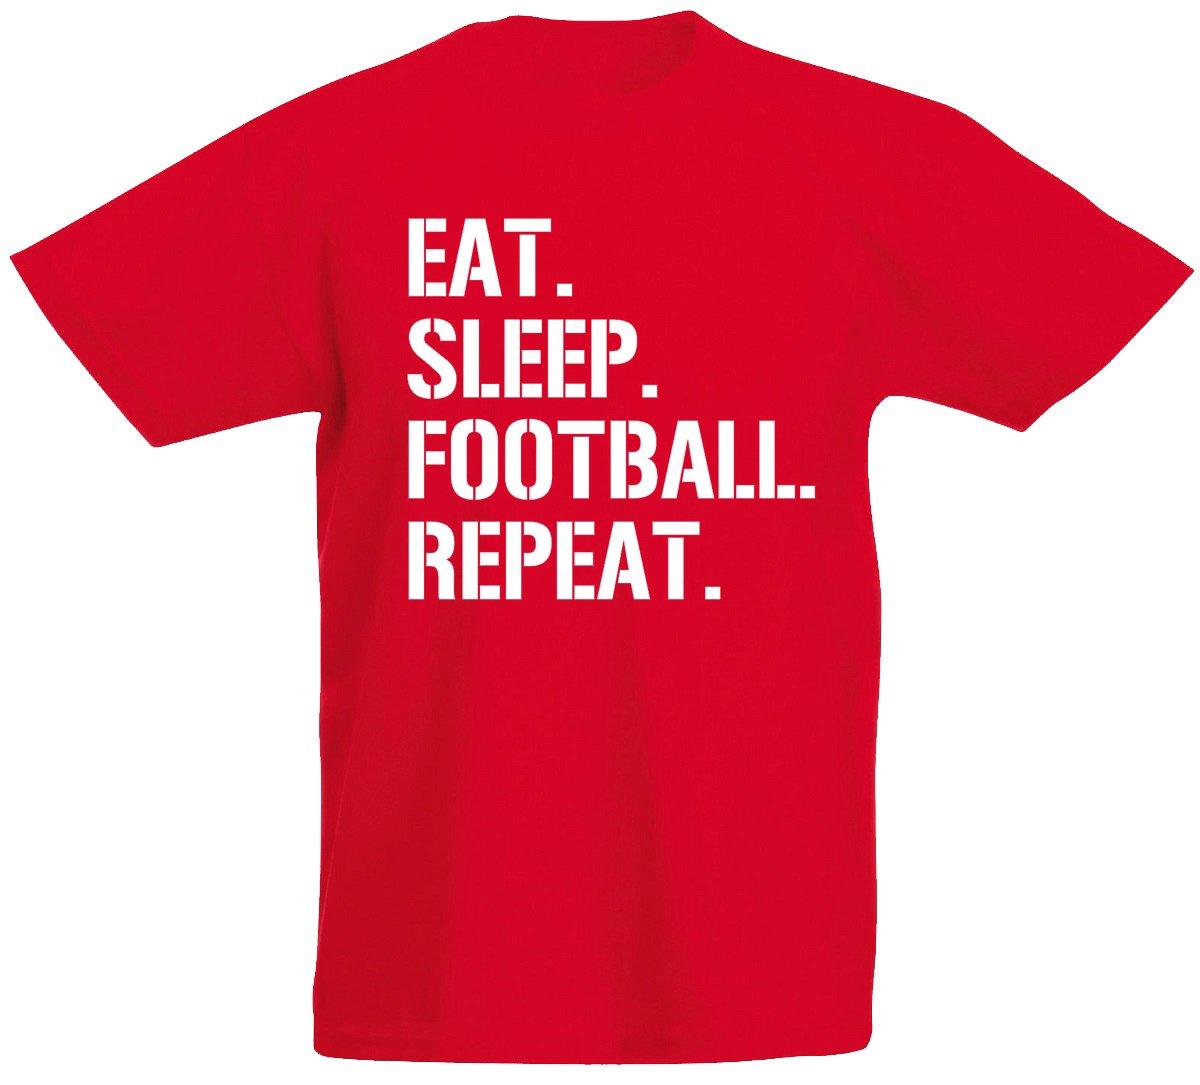 loltops Eat Sleep Football Repeat Gift T-Shirt for Boys, Kids